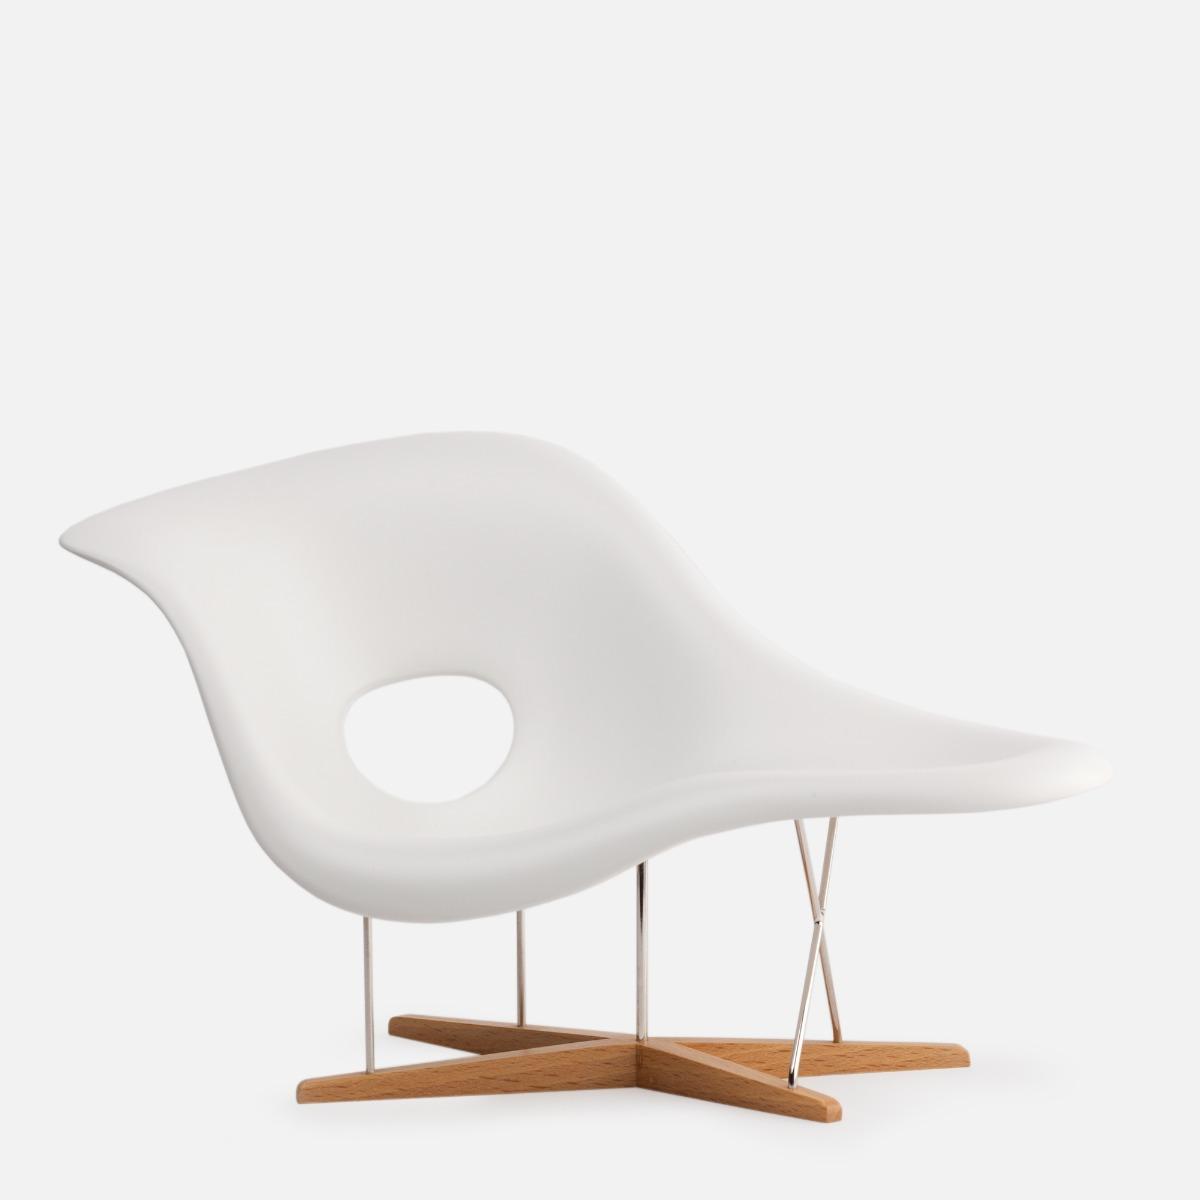 Silla La Chaise, Charles & Ray Eames, 1948